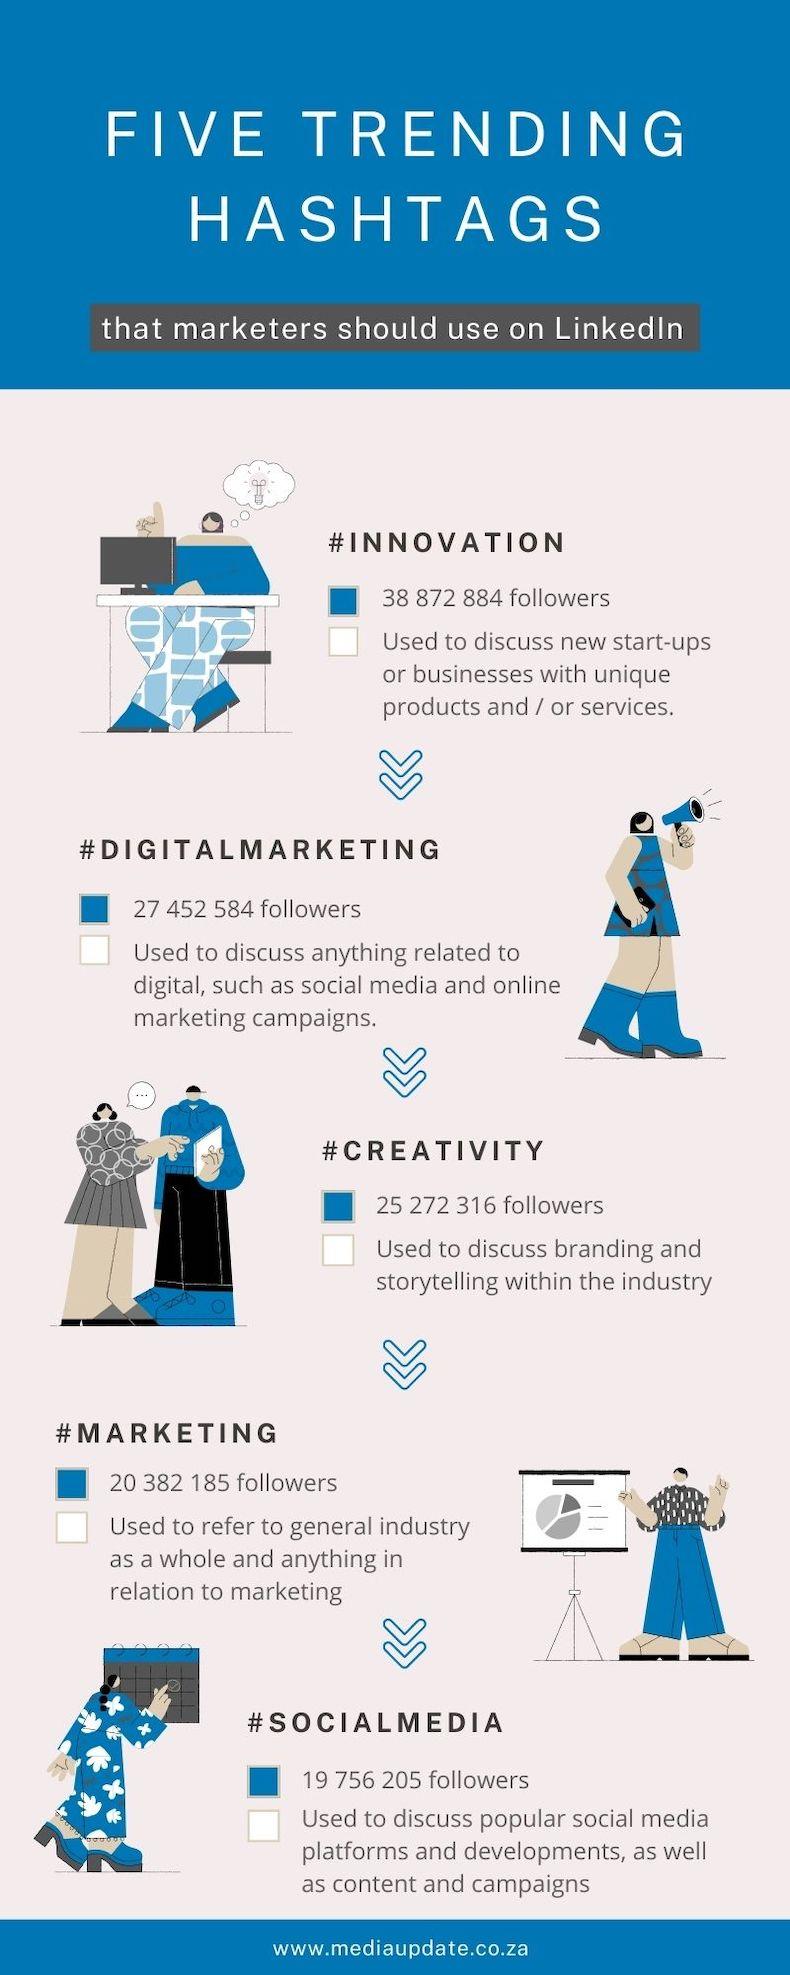 Five hashtags marketers should use on LinkedIn